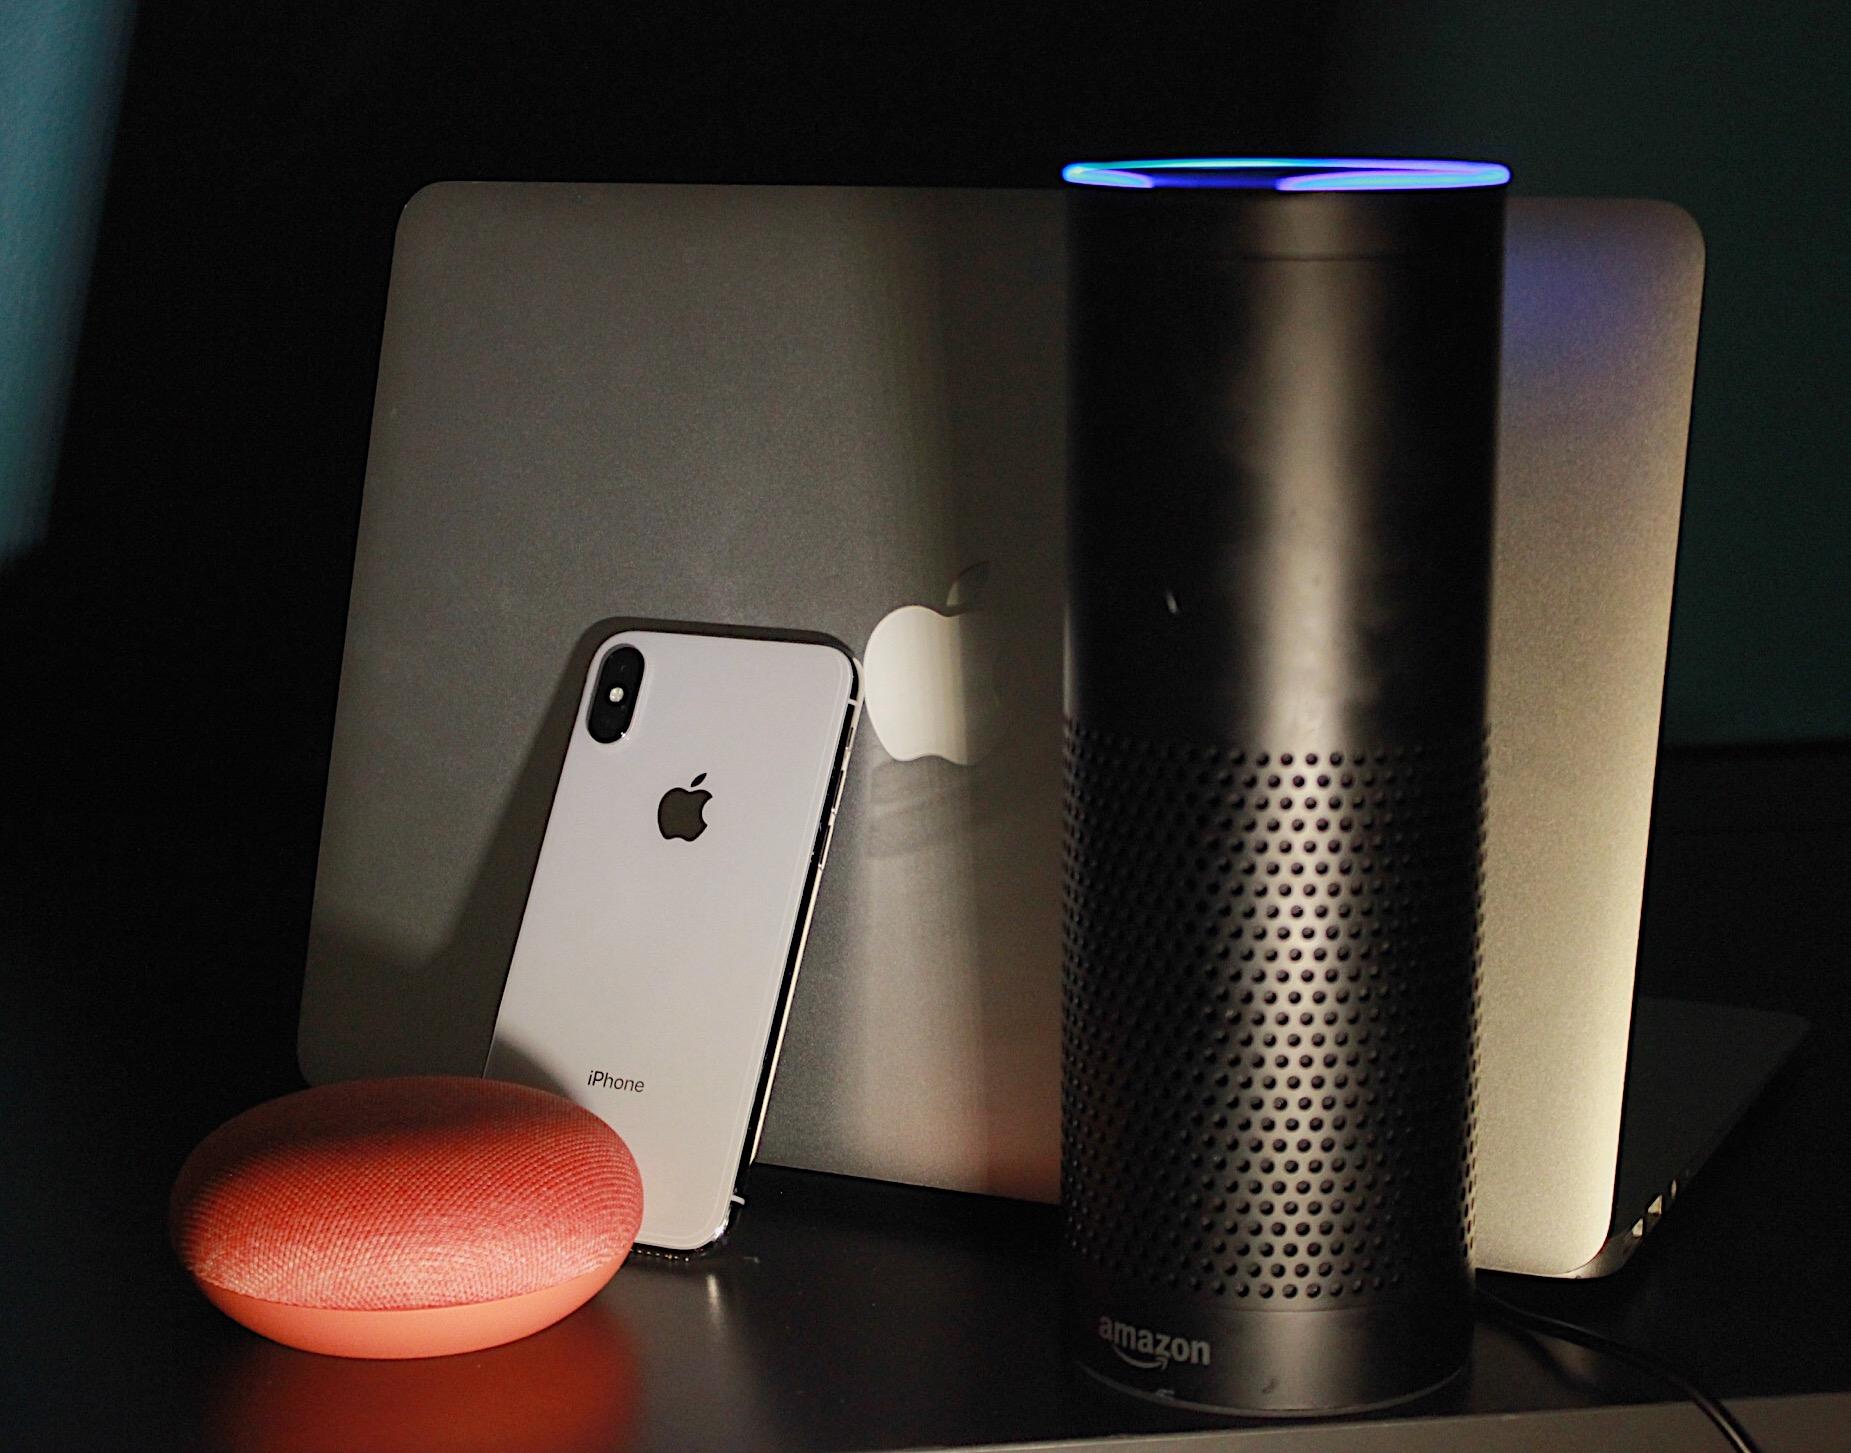 Apple, Amazon and Google form a surprising partnership?